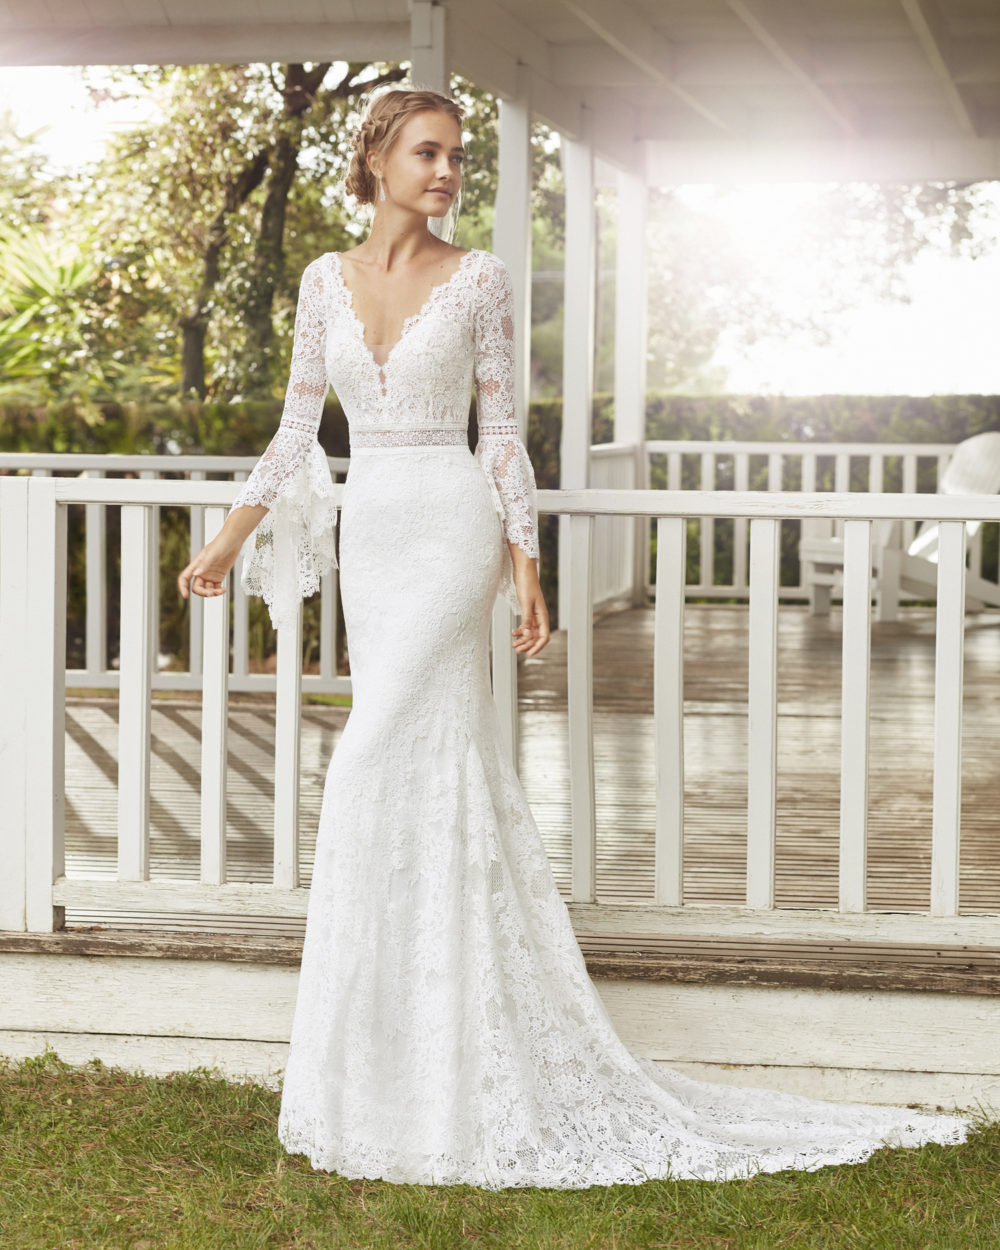 Mariages: abito da sposa Rosa Clarà 2020 a Vicenza, Verona, Padova, Veneto 4A122 CANDID